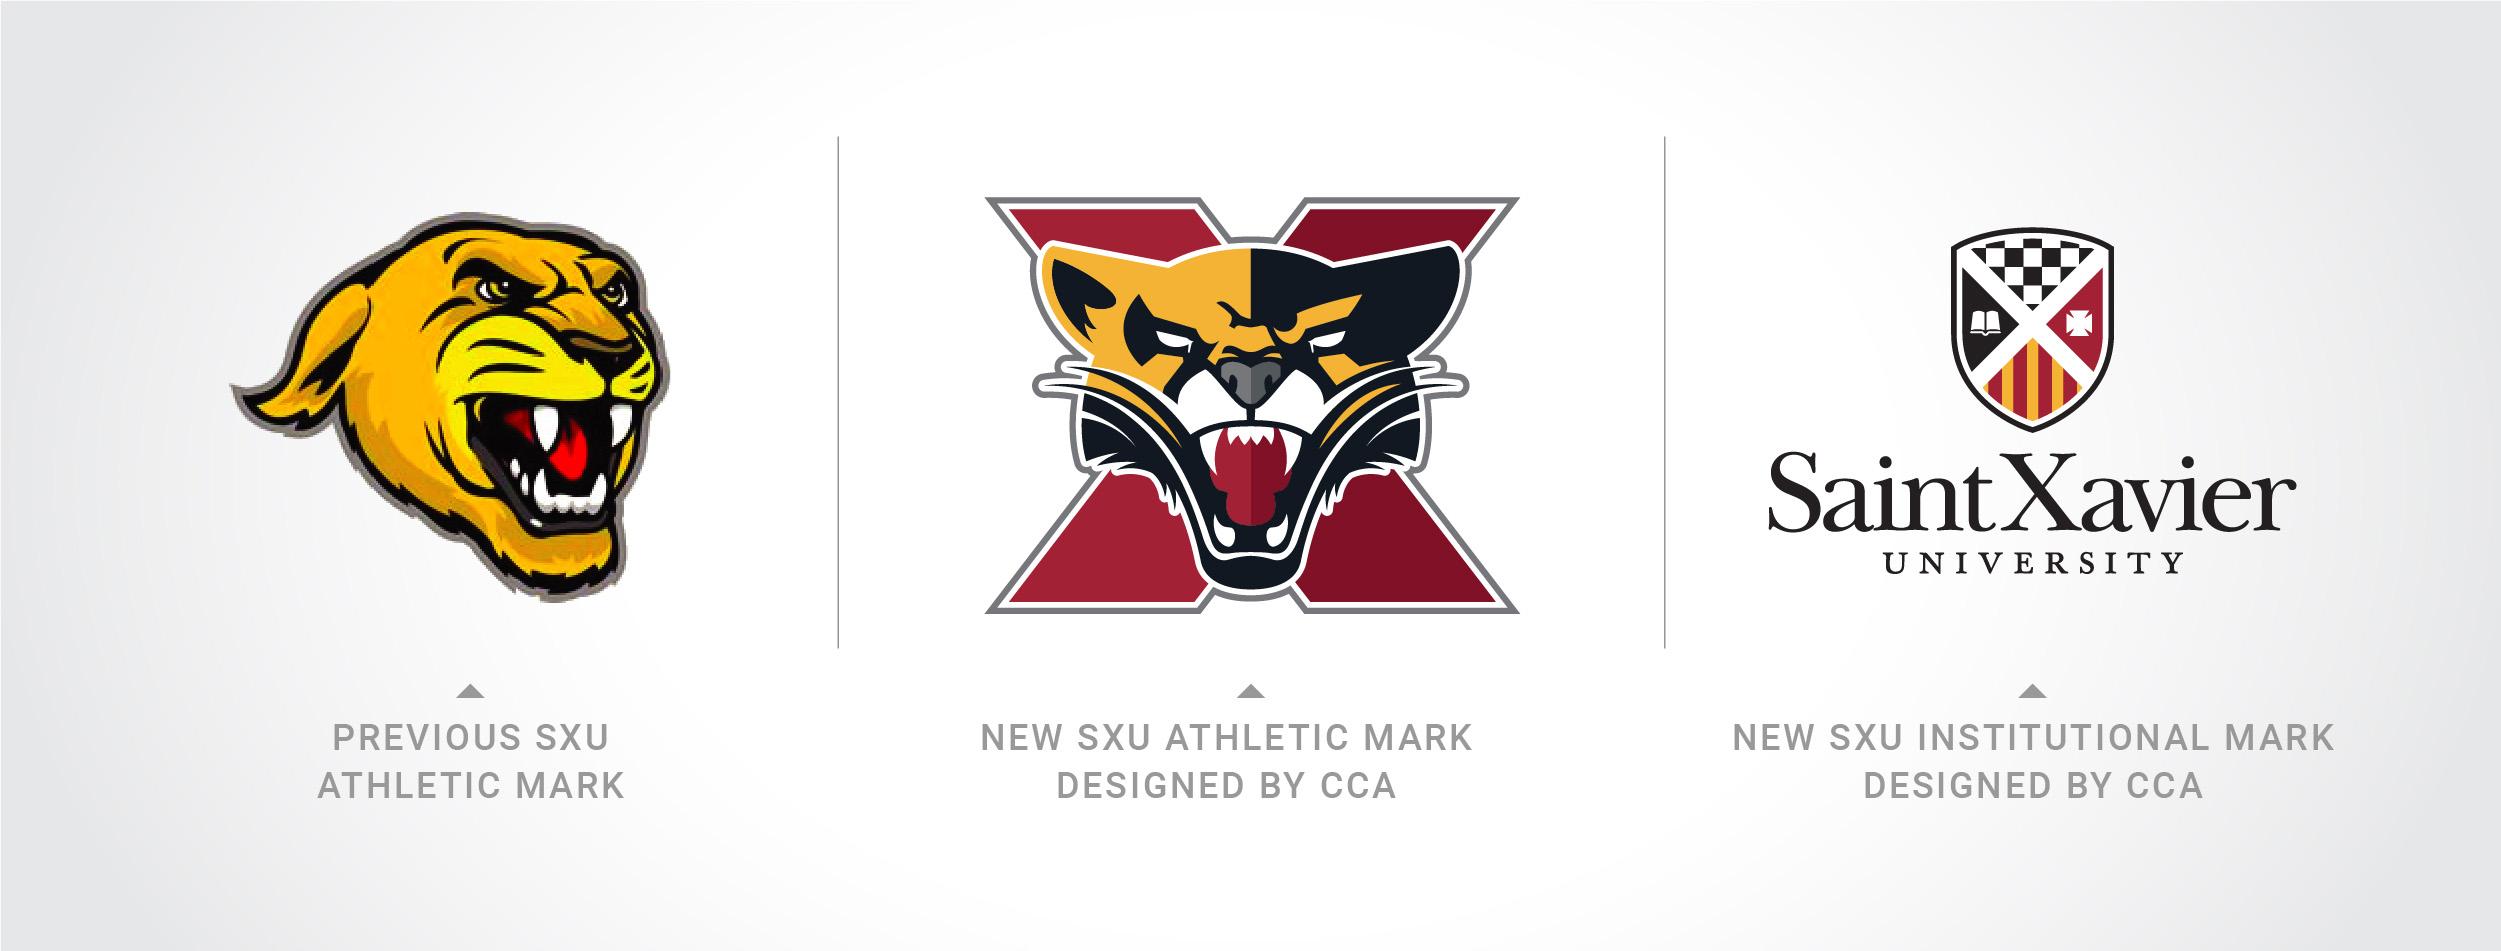 Saint Xavier University's new athletic logo vs old